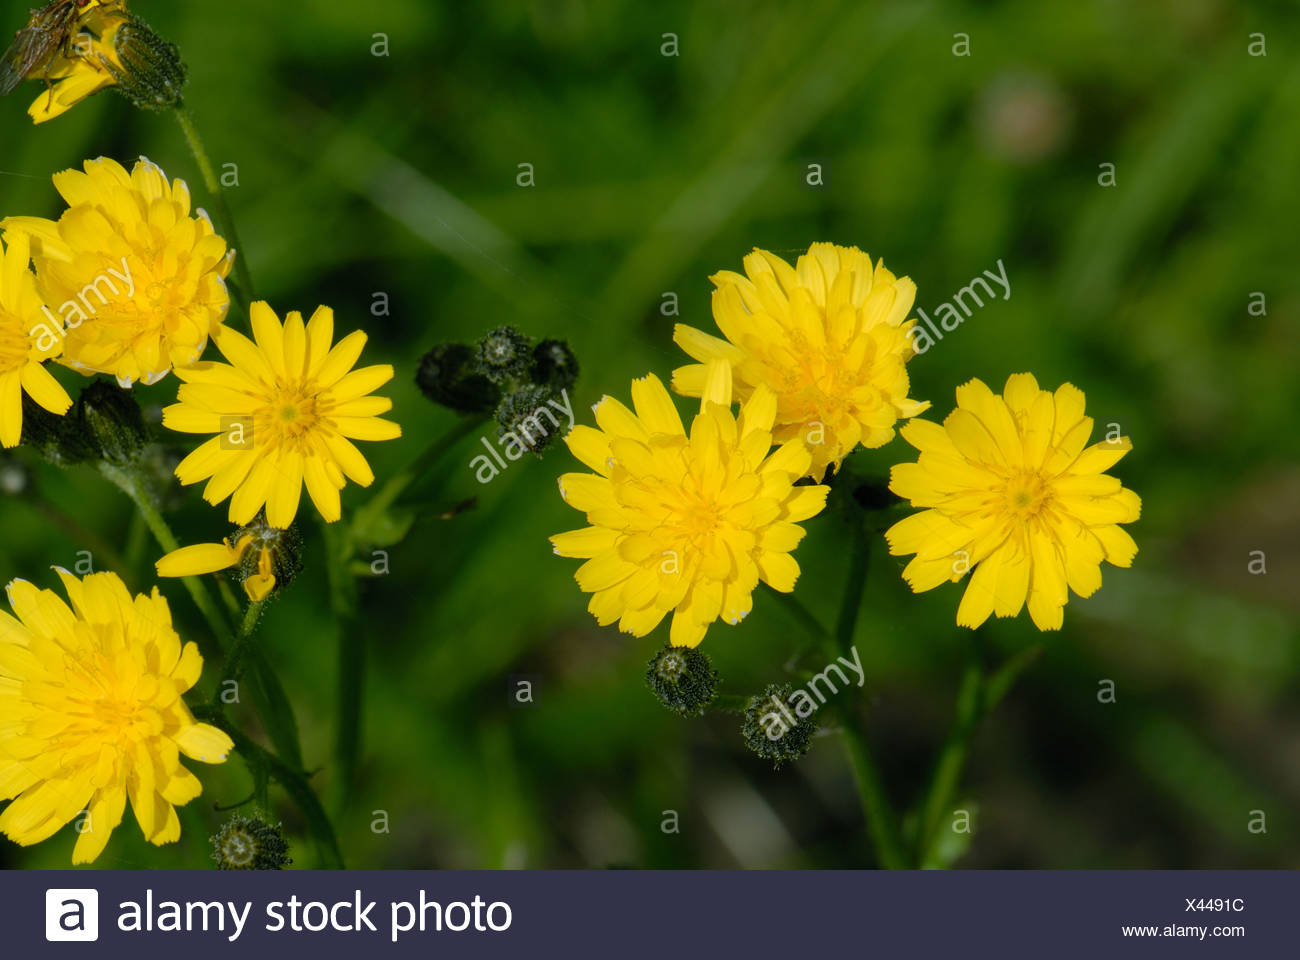 Smooth Hawksbeard Crepis Capillaris Yellow Flowers On Grassland Weed